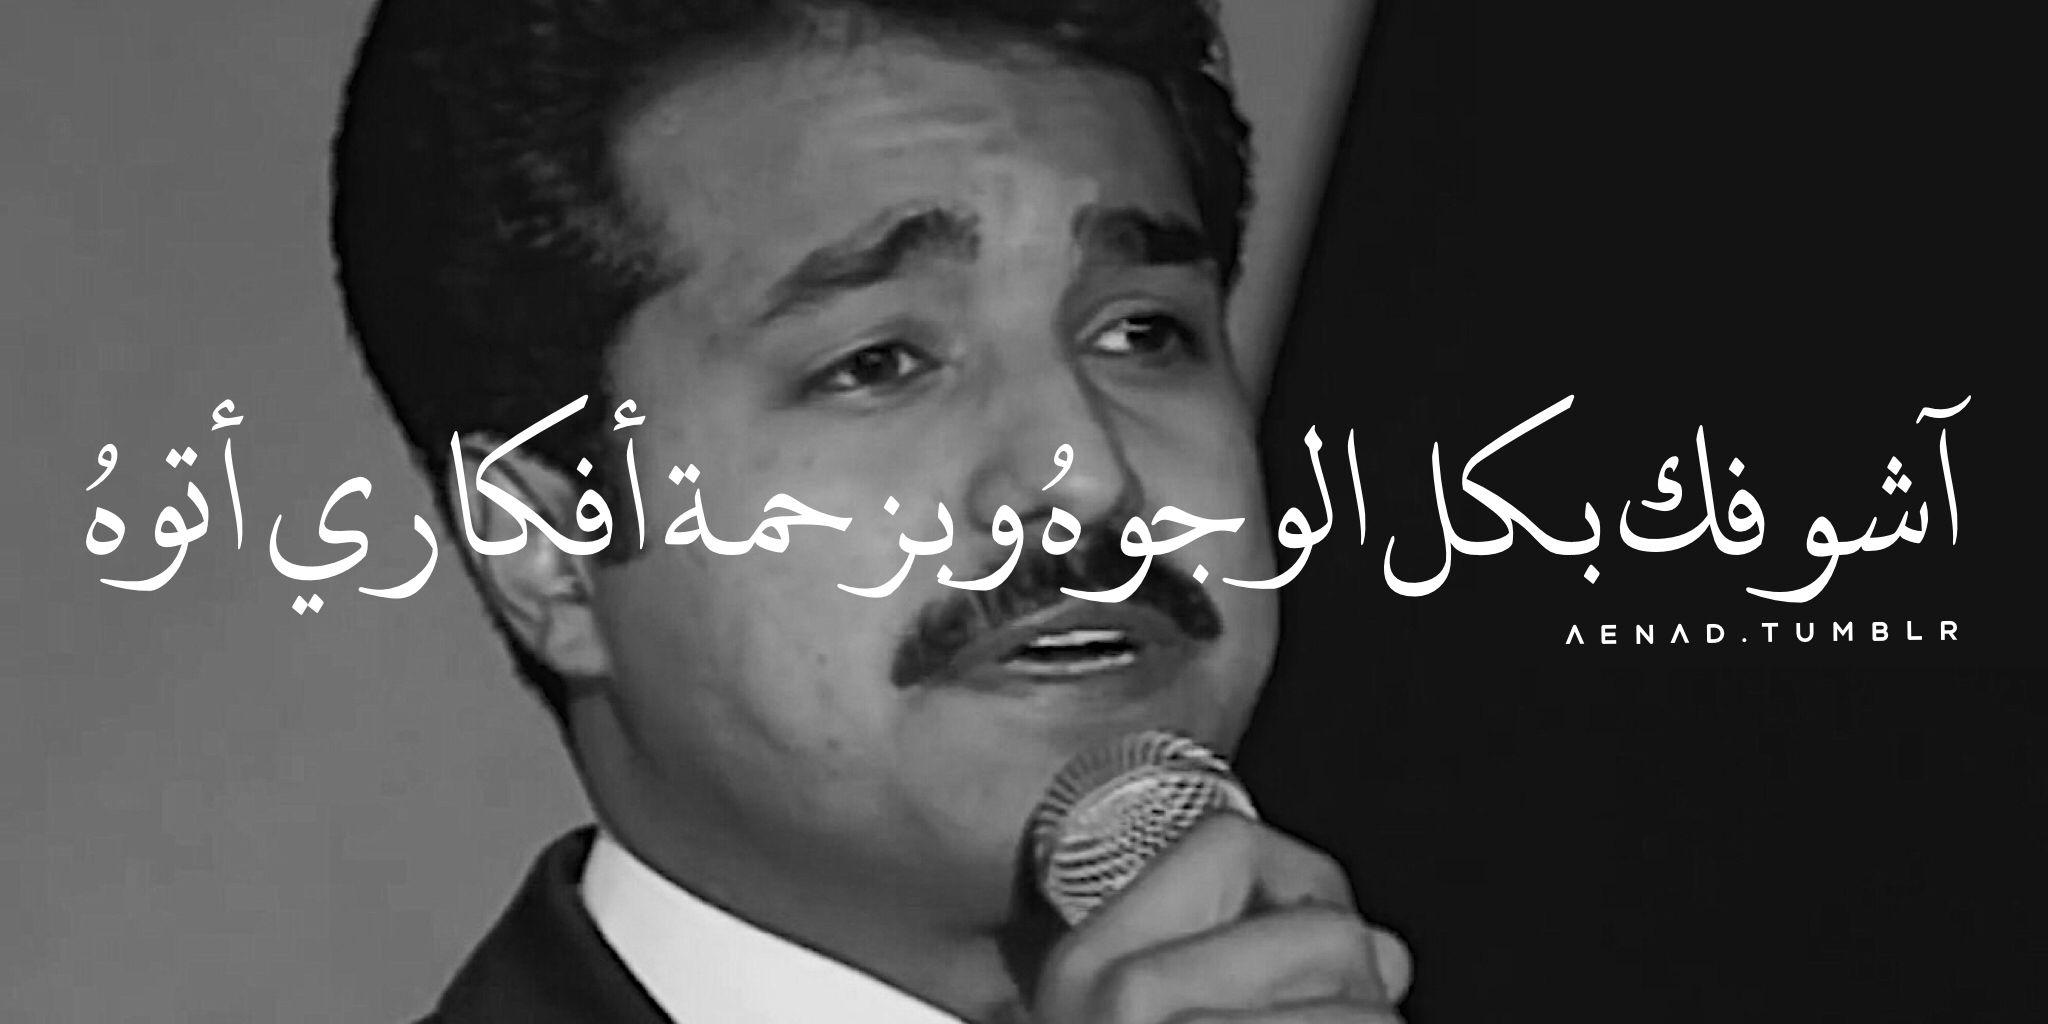 راشد الماجد Cover Photo Quotes Beautiful Arabic Words Twitter Header Pictures